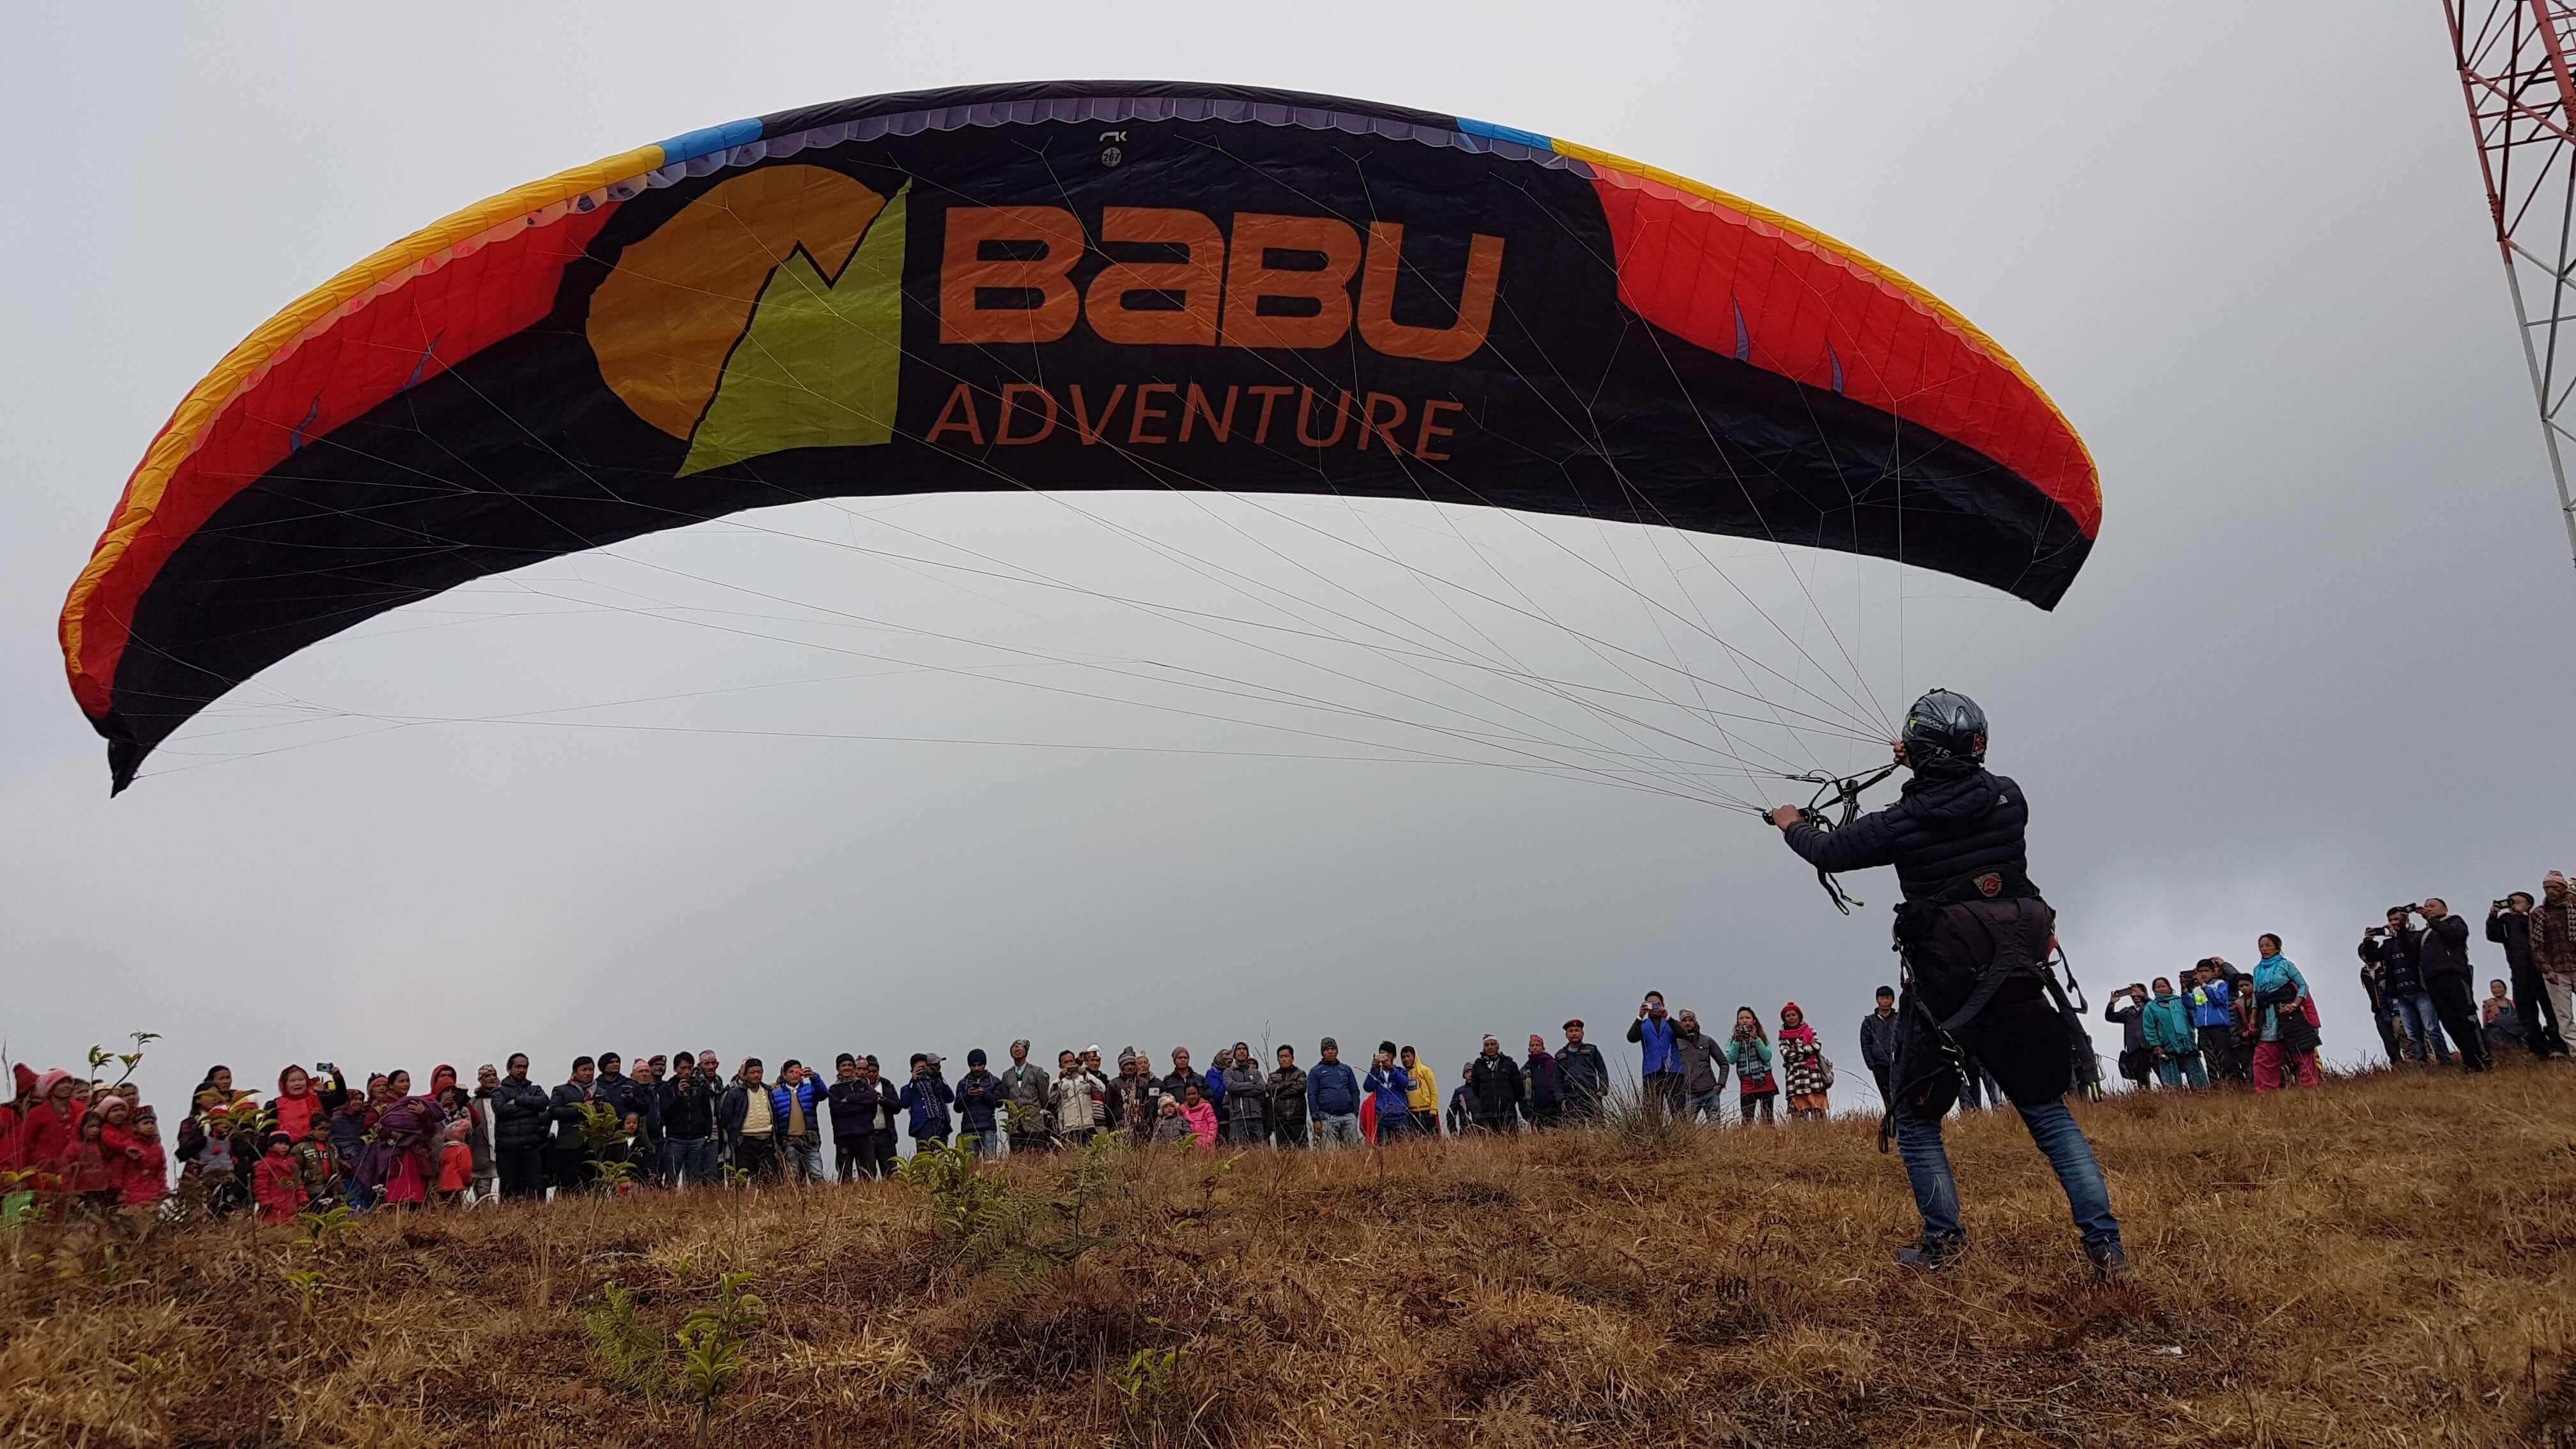 The Babu Adventures